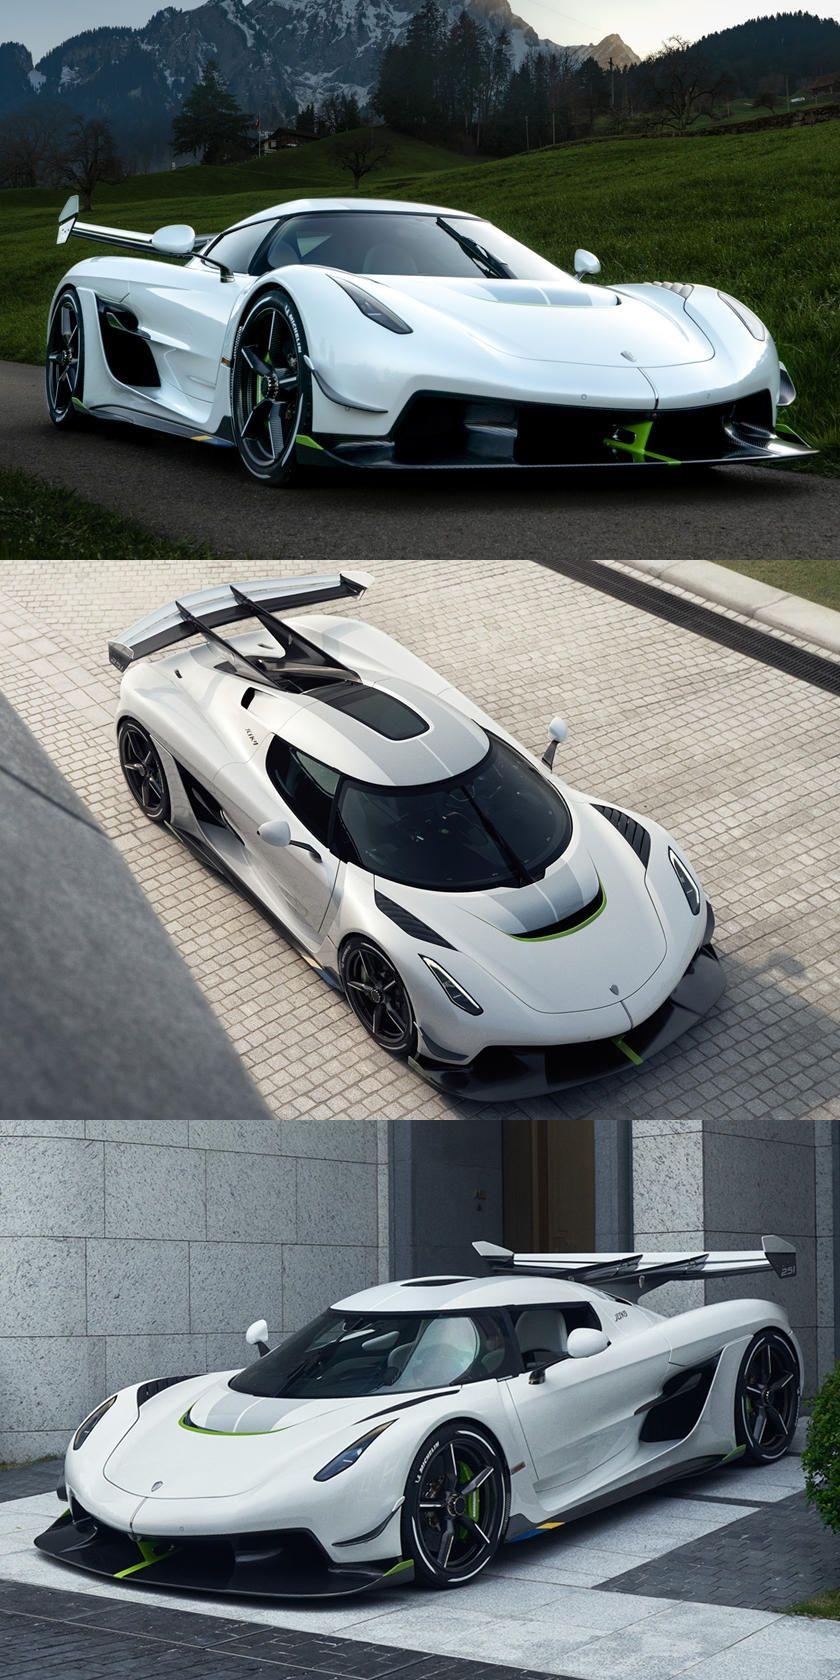 Special Edition Koenigsegg 'Mission 500' Hypercar Coming To Battle Bugatti